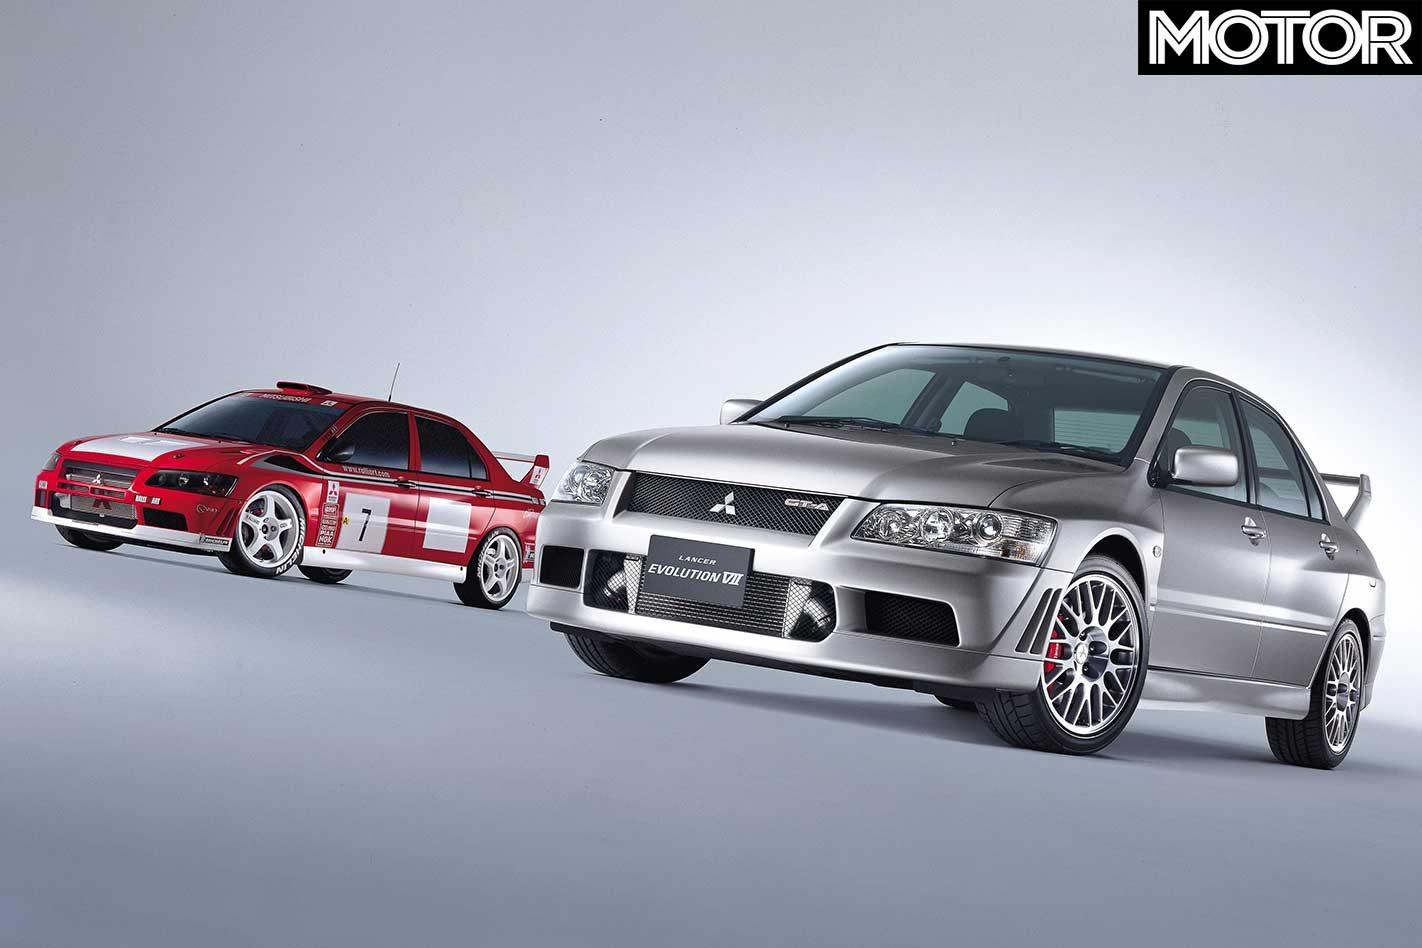 2004 Mitsubishi Lancer Evolution Viii Review Classic Motor